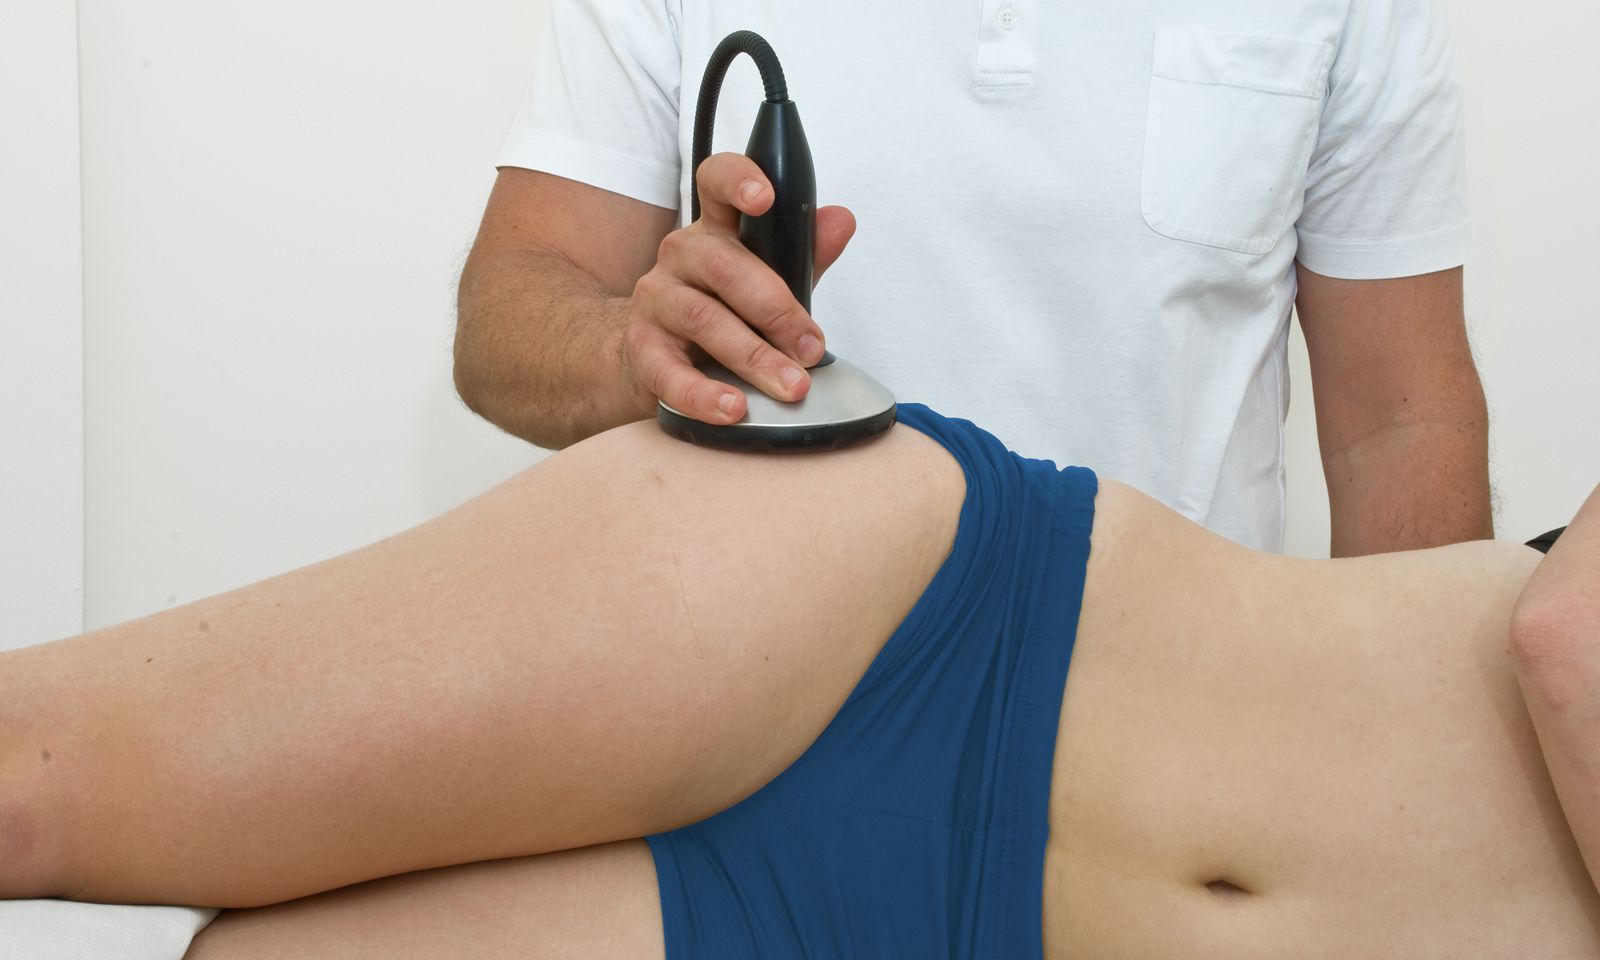 Stoßwellentherapie lindert unter anderem Schmerzen bei muskulären Verspannungen.